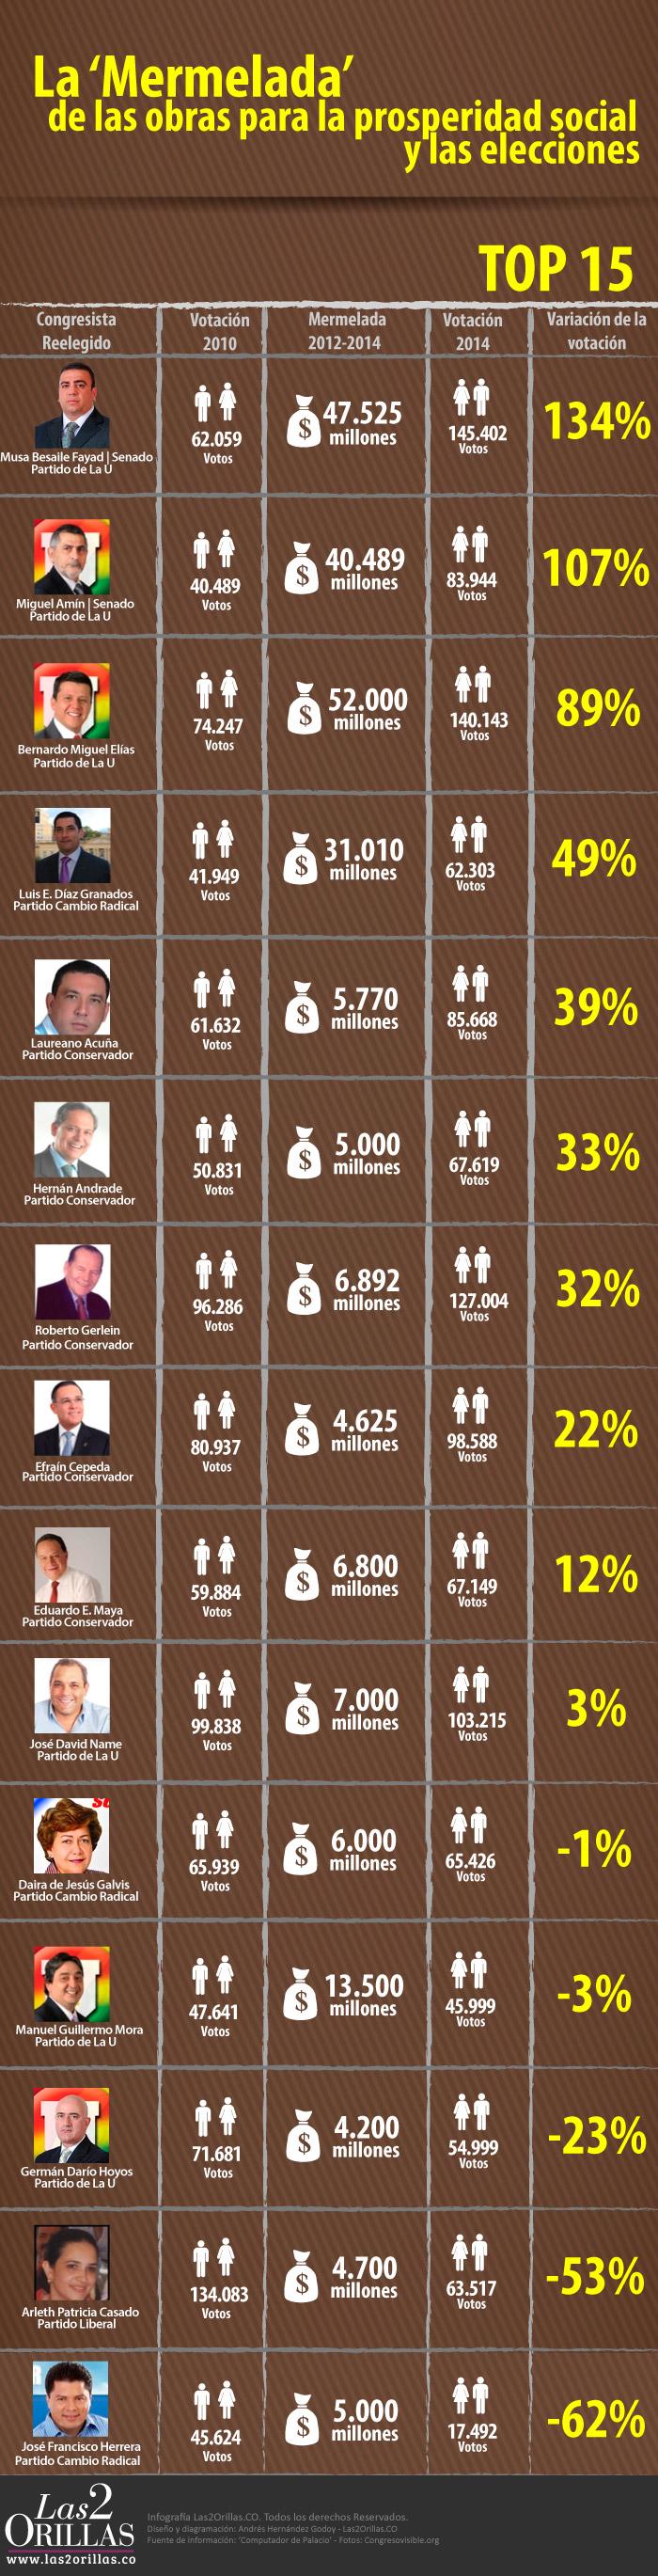 Infografia-Mermelada-Votos-Obras-Prosperidad-Social (1)